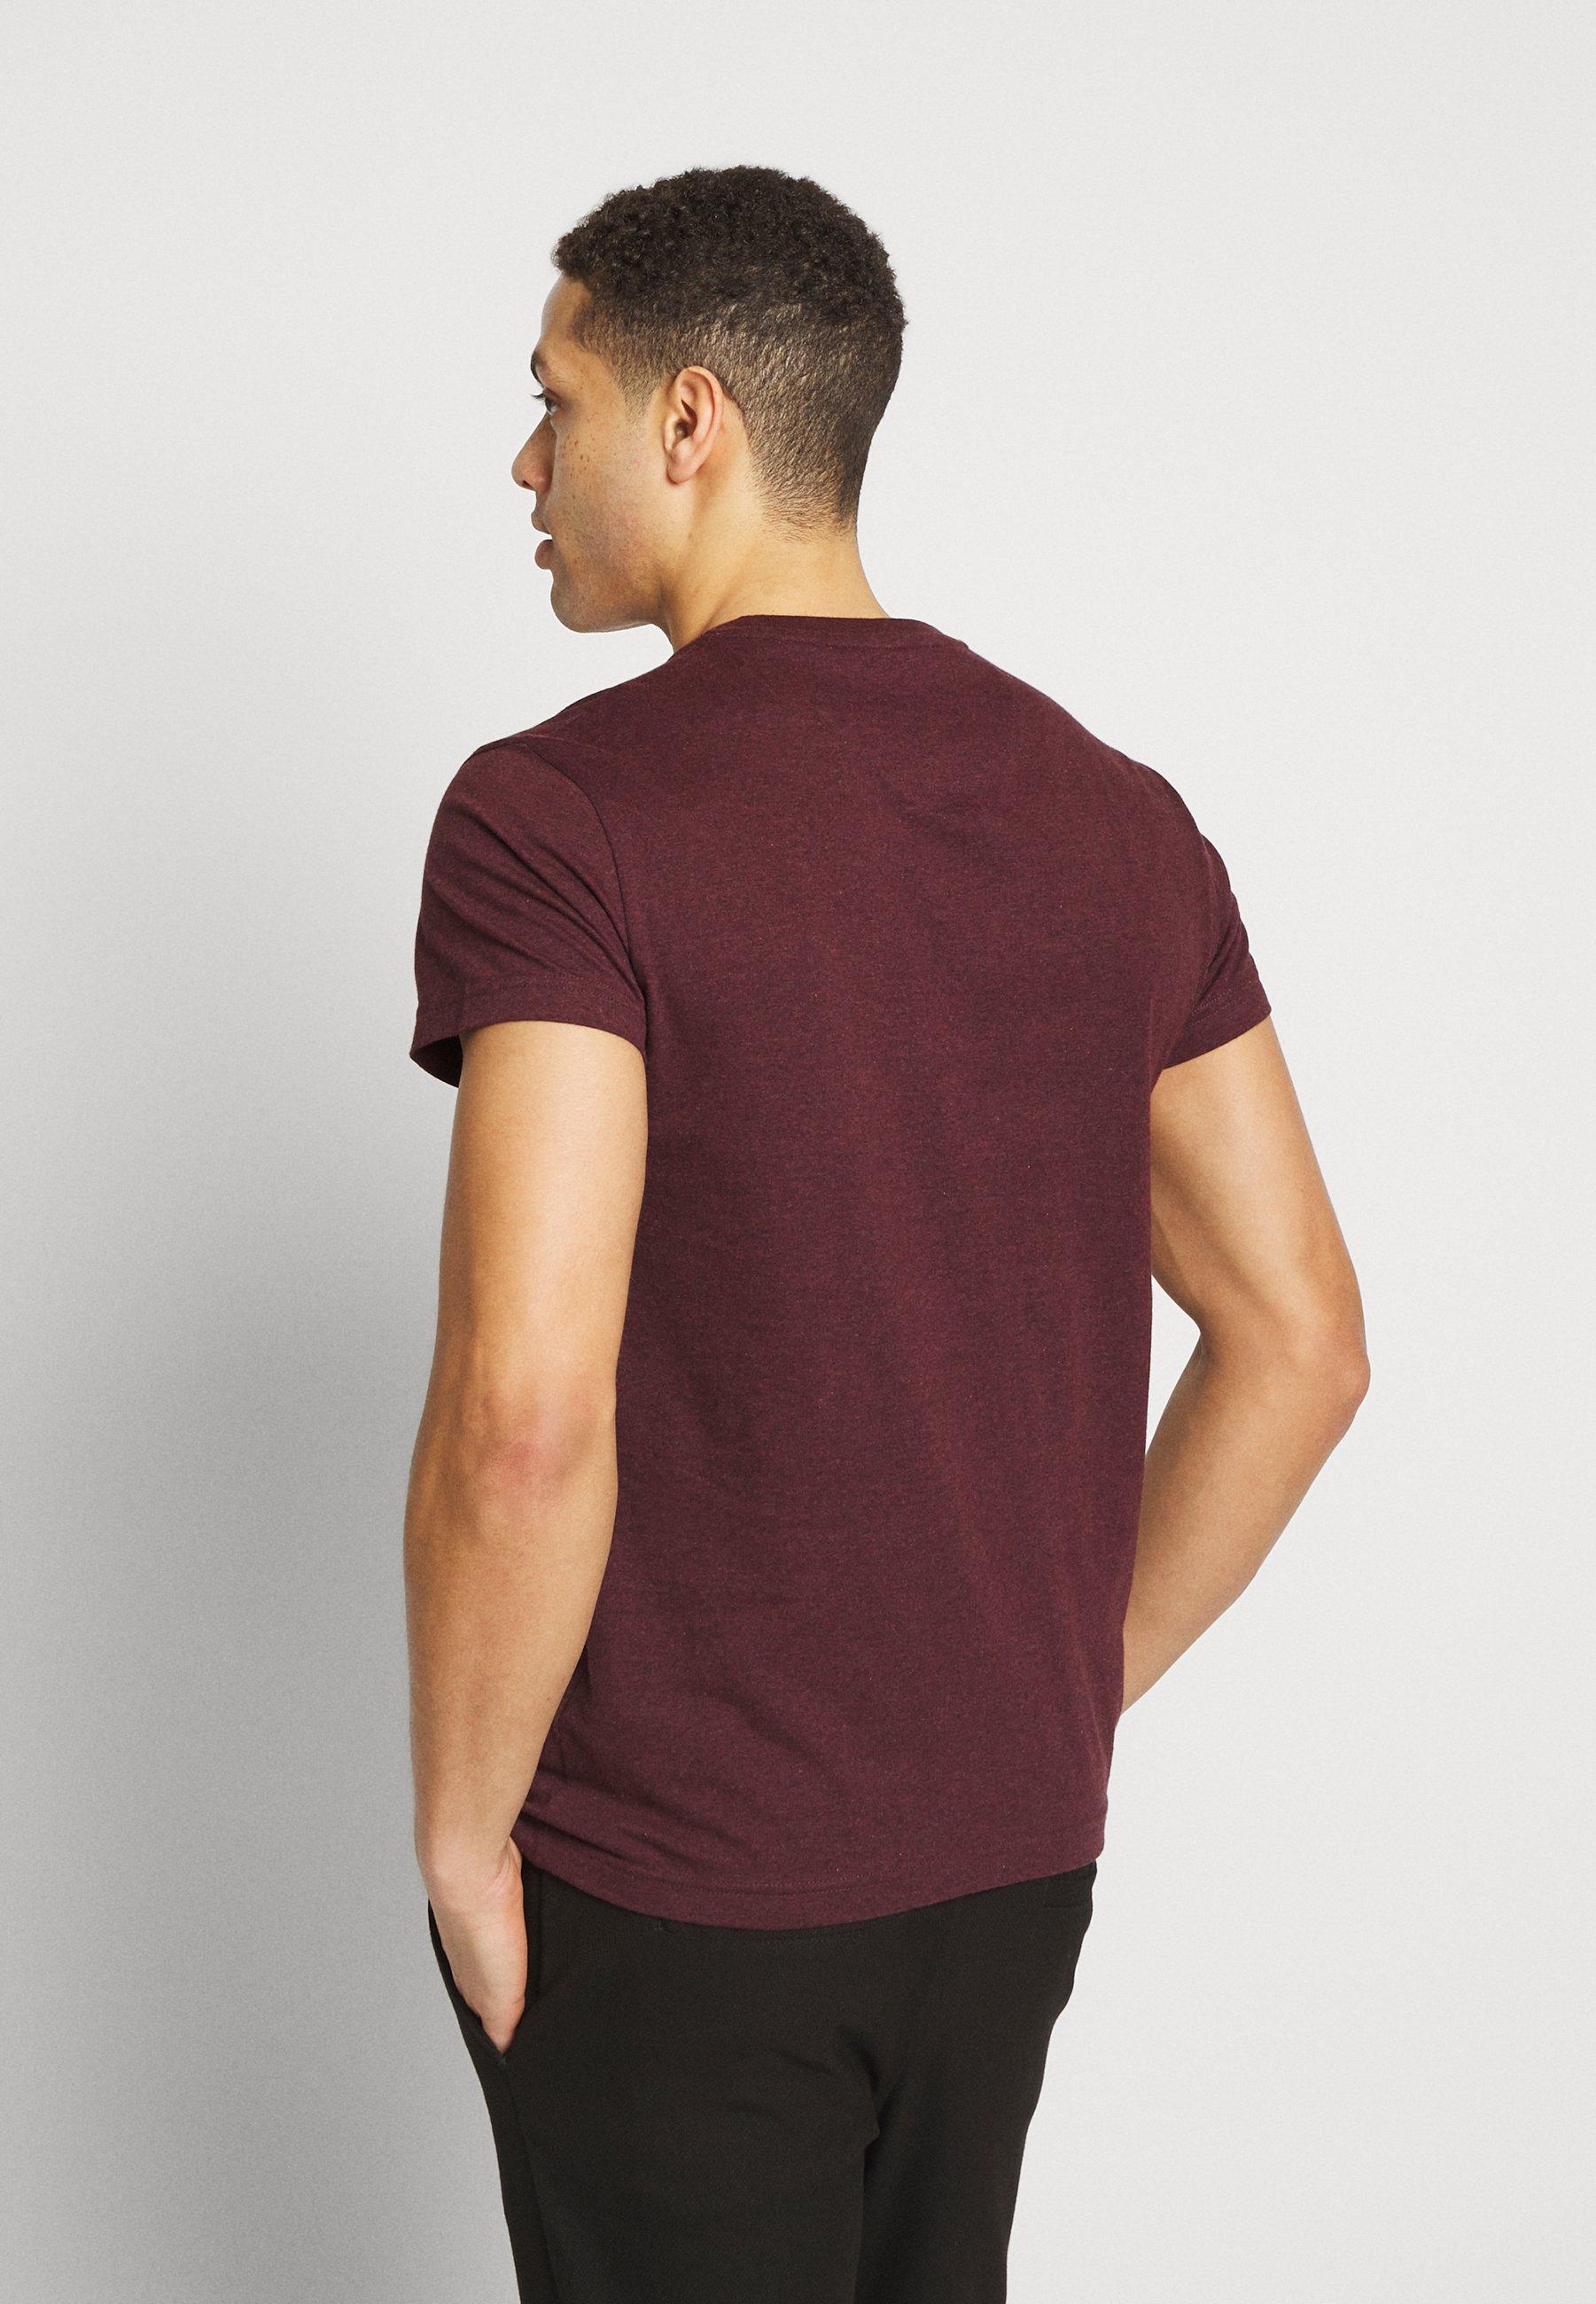 Farah FARRIS TWIN 2 PACK - T-shirt basic - farah red marl/true navy